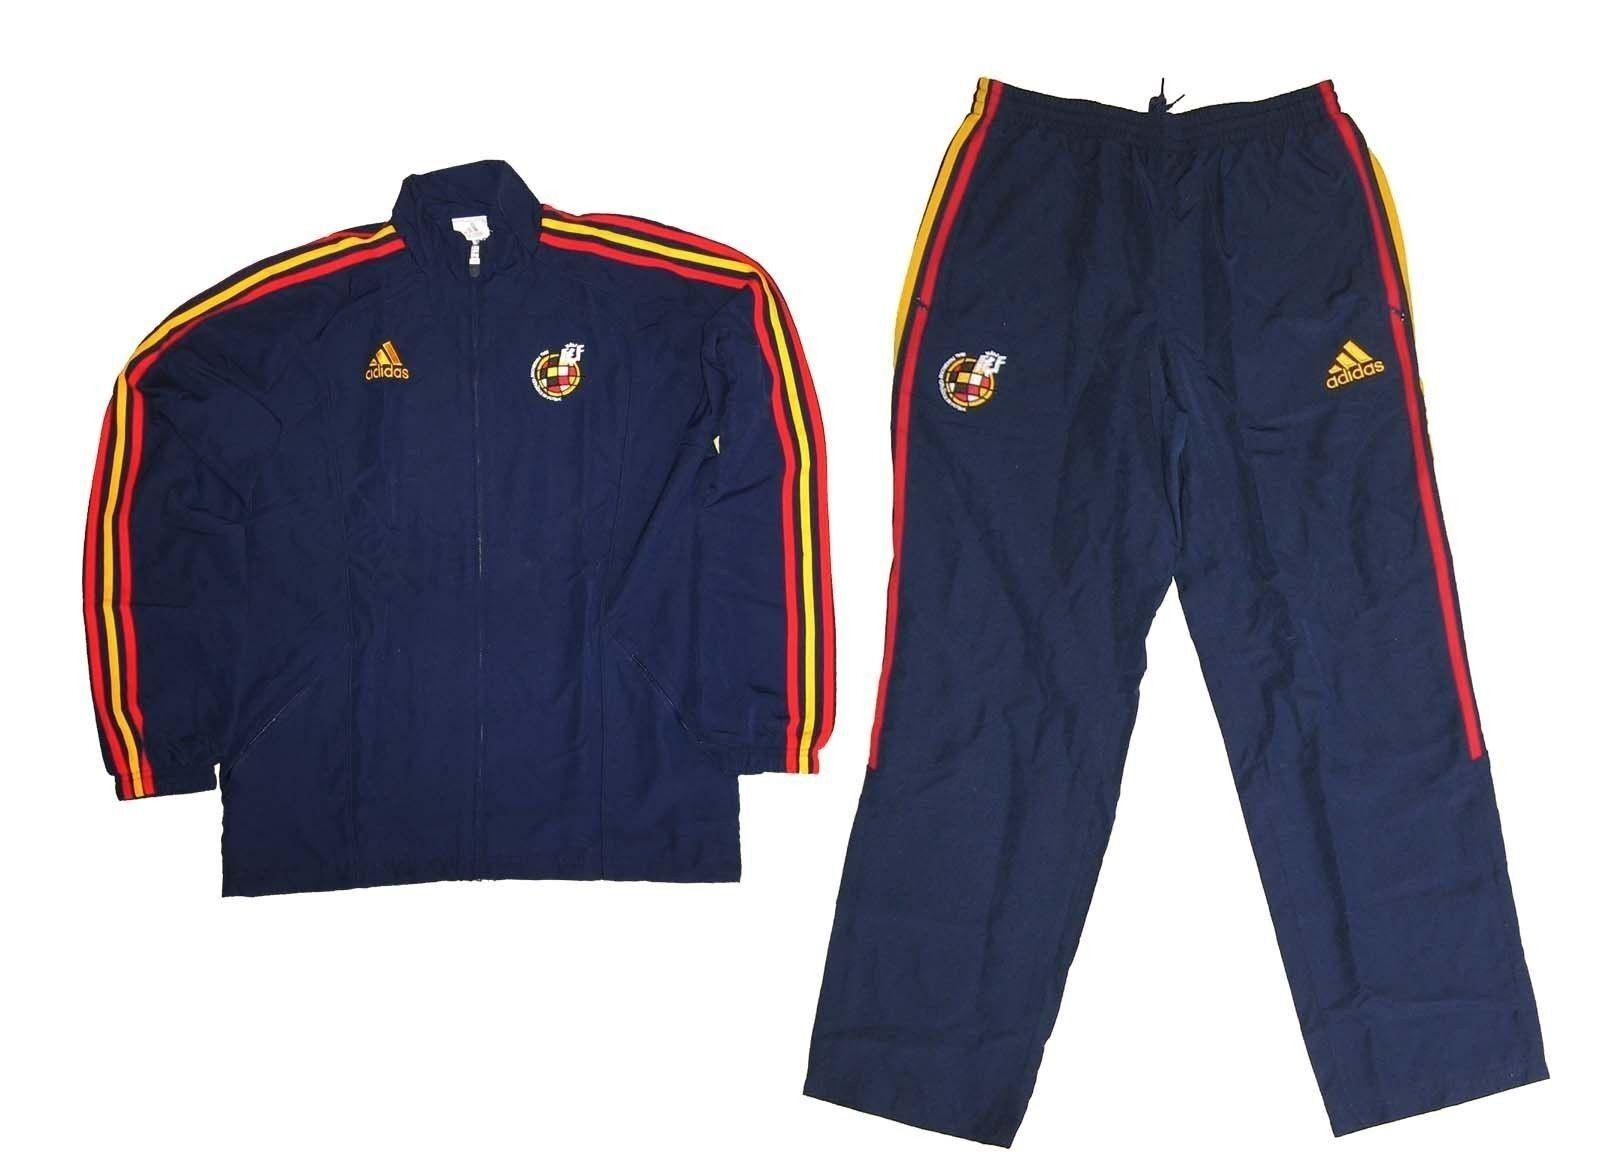 Spanien Spain Espana Trainingsanzug Presentation Suit Chándal Adidas Gr.M (5)  | Nicht so teuer